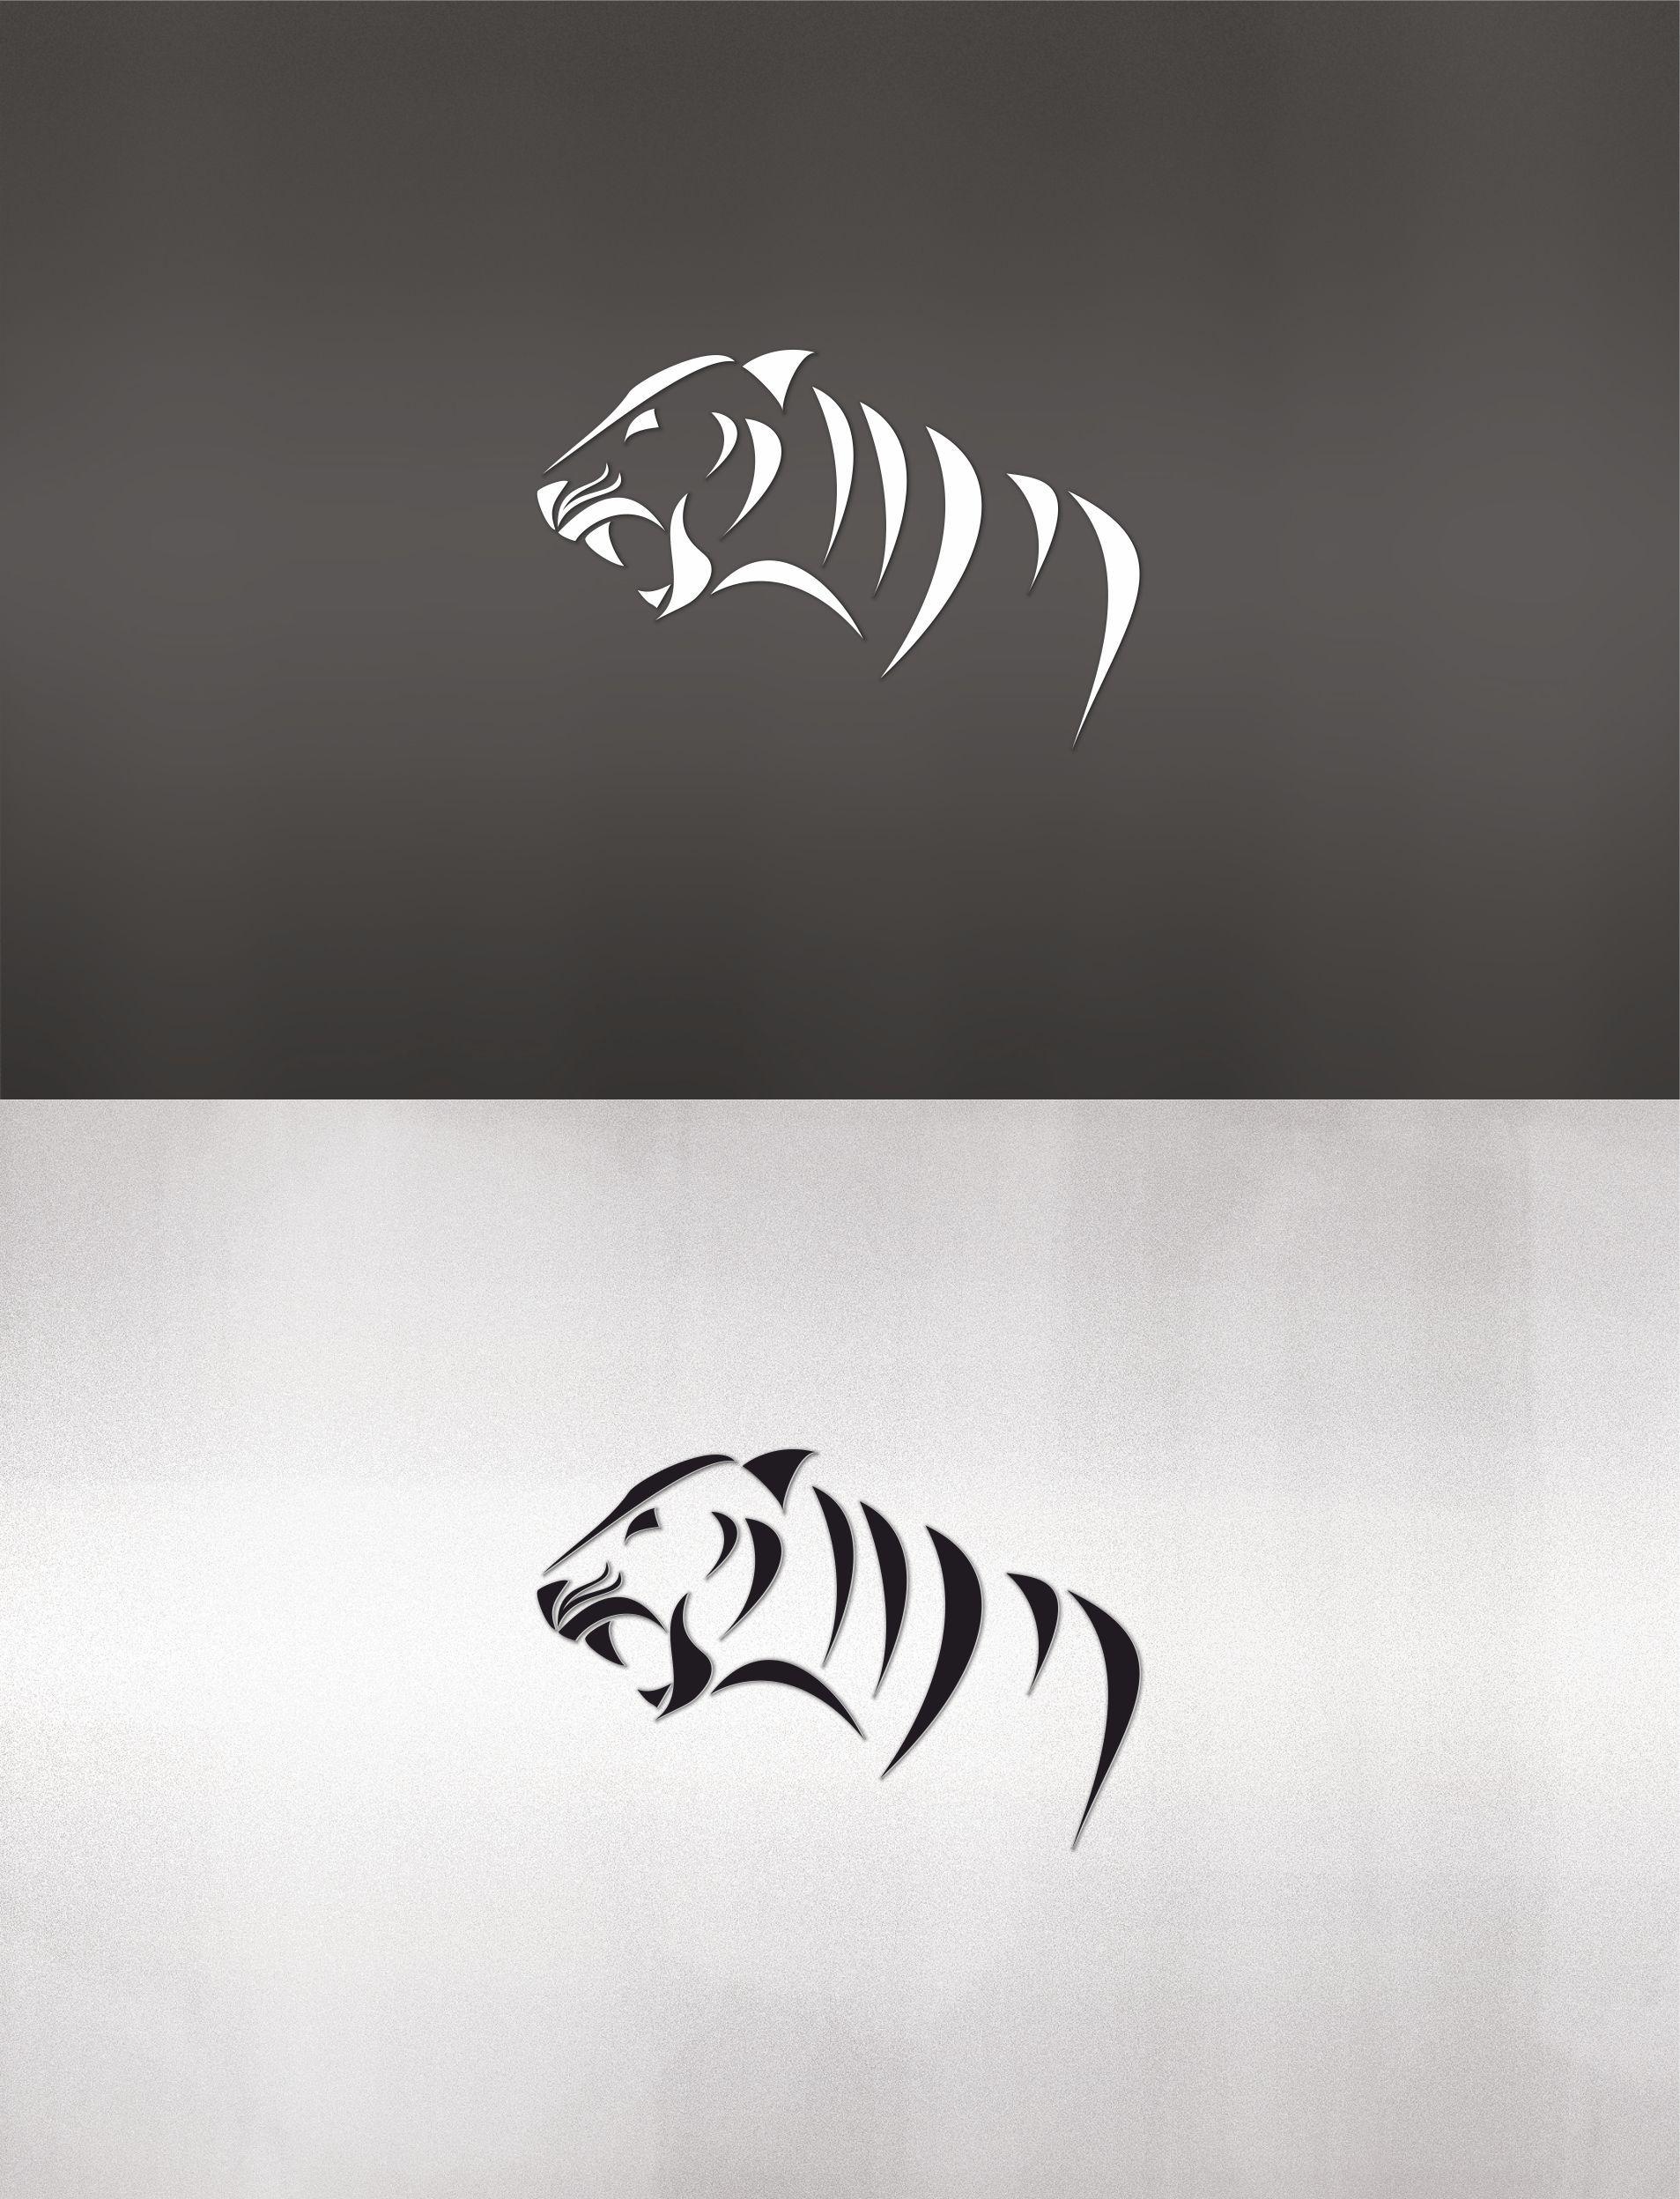 Tiger logo more tiger pinterest tattoos tattoo designs and